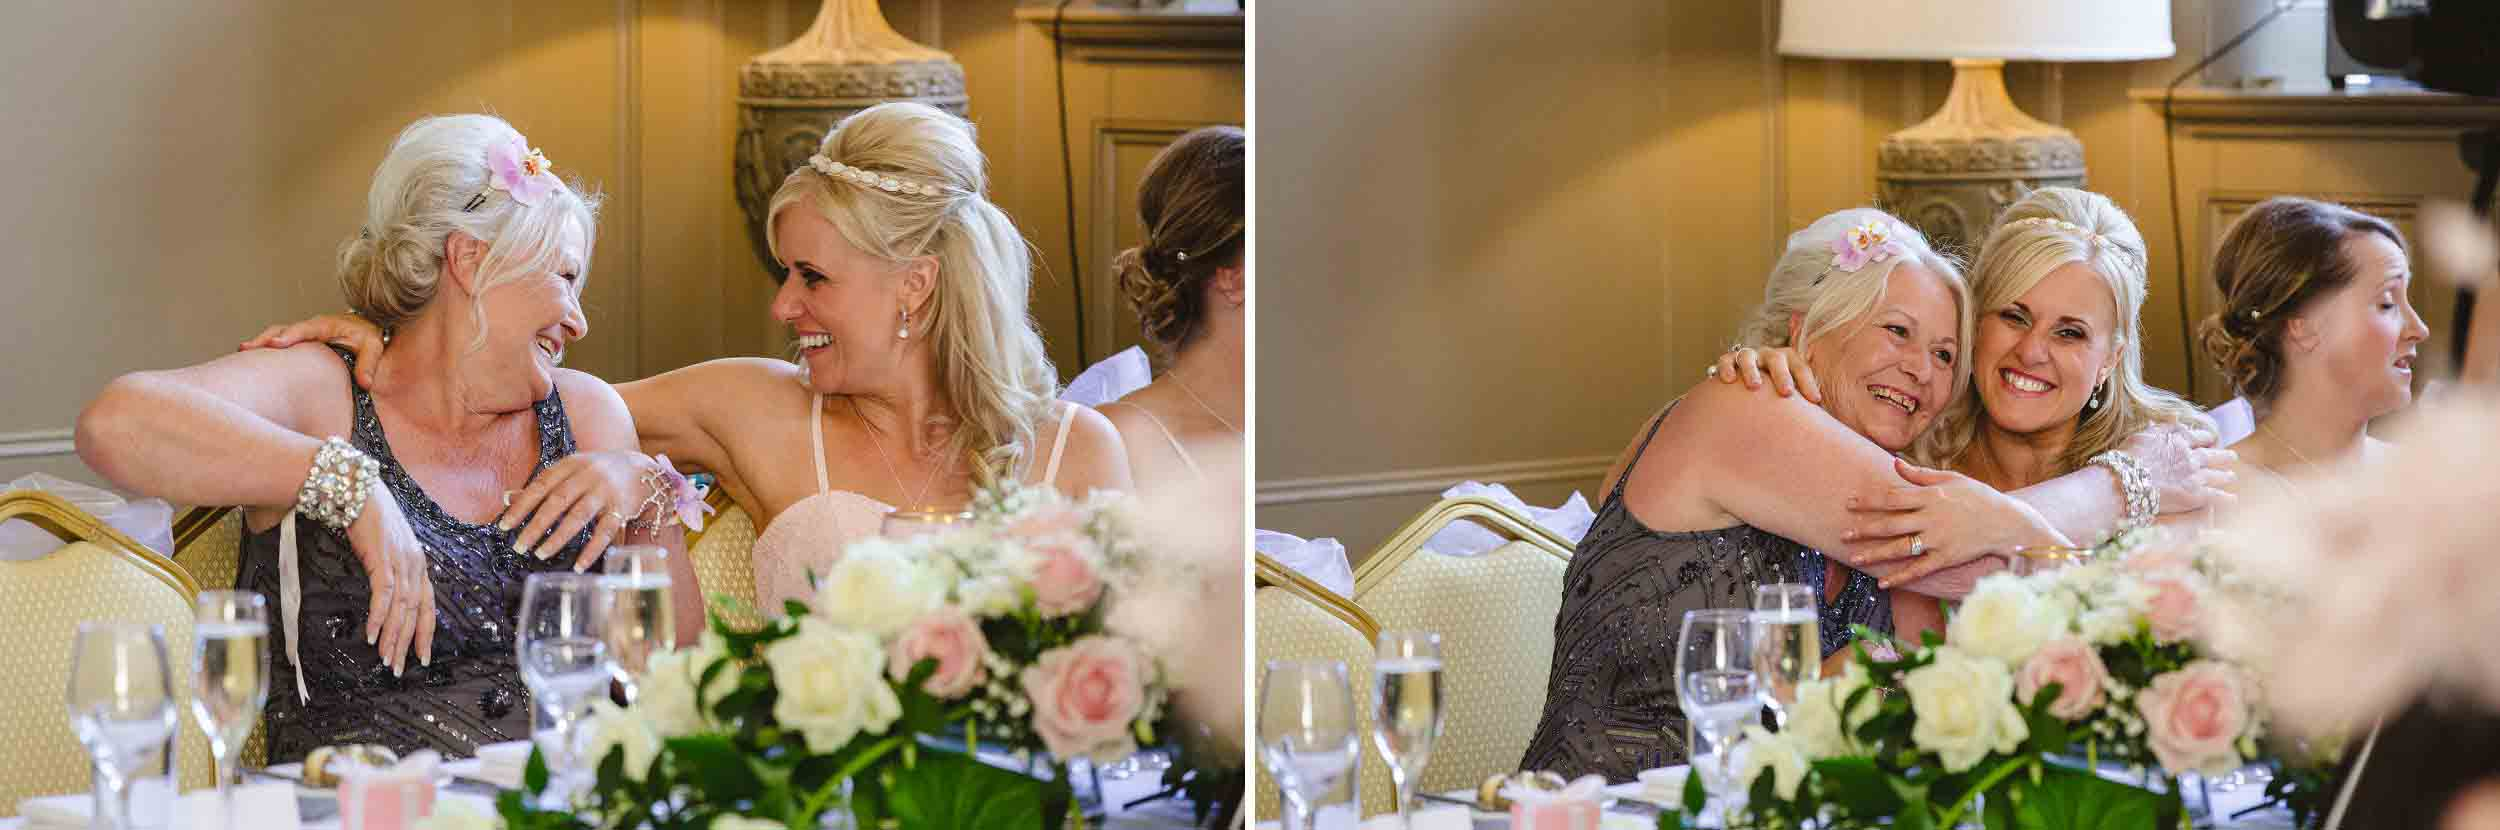 Ellingham-Hall-Wedding-Photographer-59.jpg